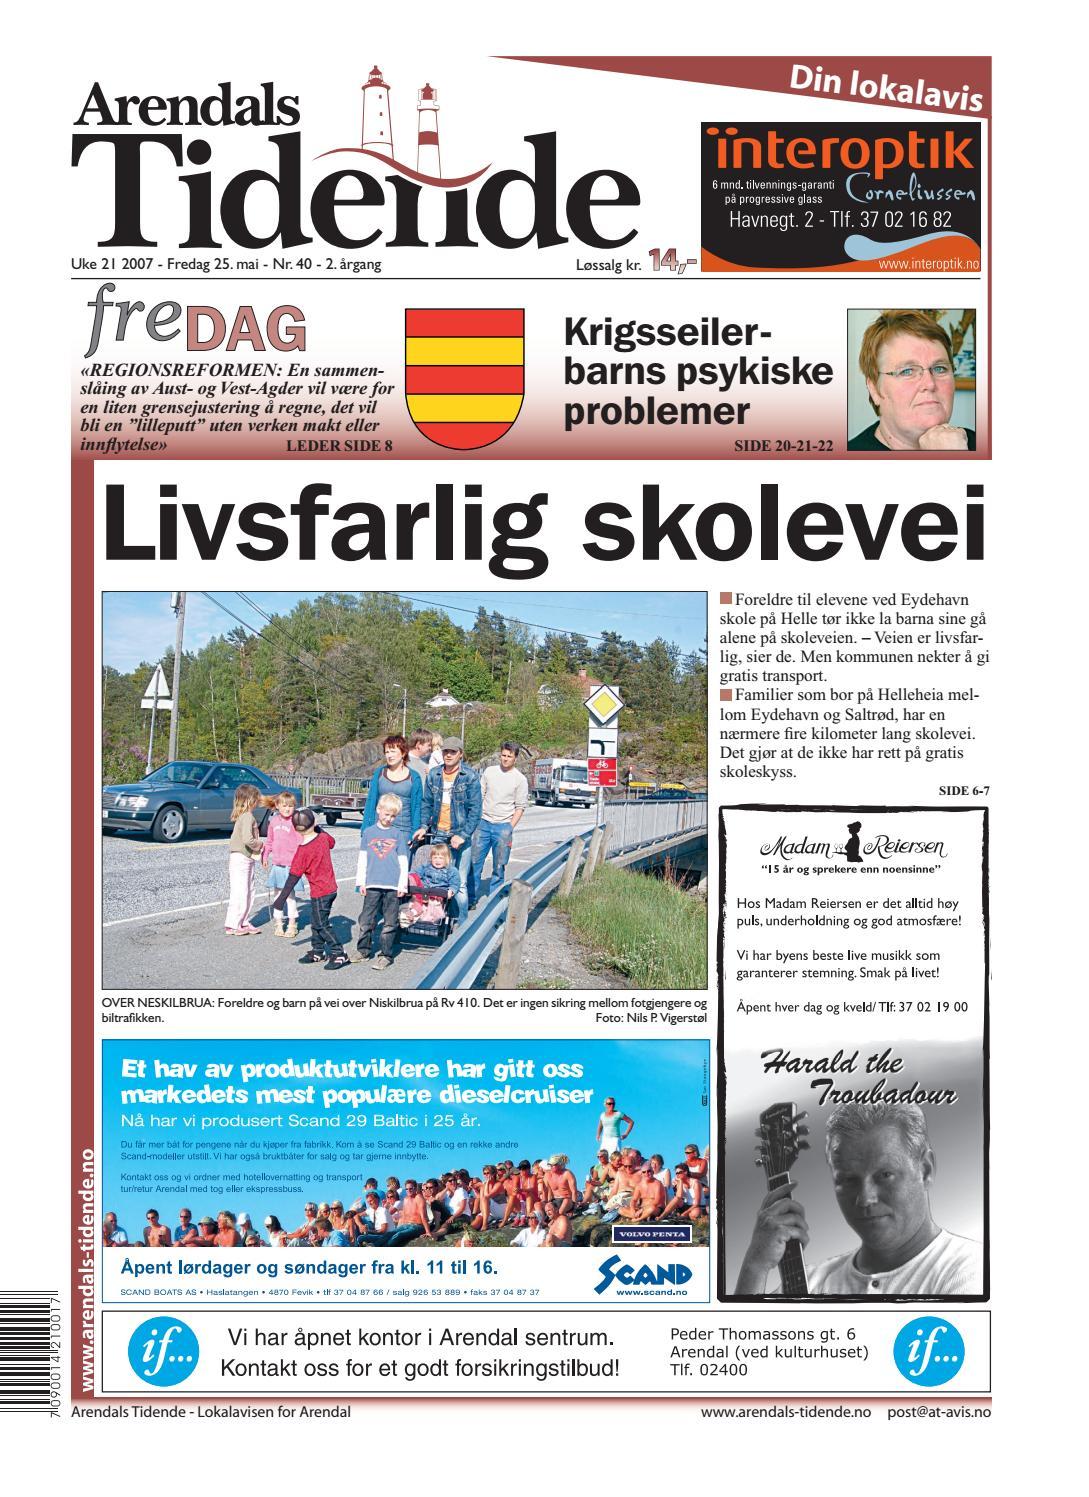 3ae5b746 Arendalstidende 20070525 000 00 00 by Tvende Media AS - issuu